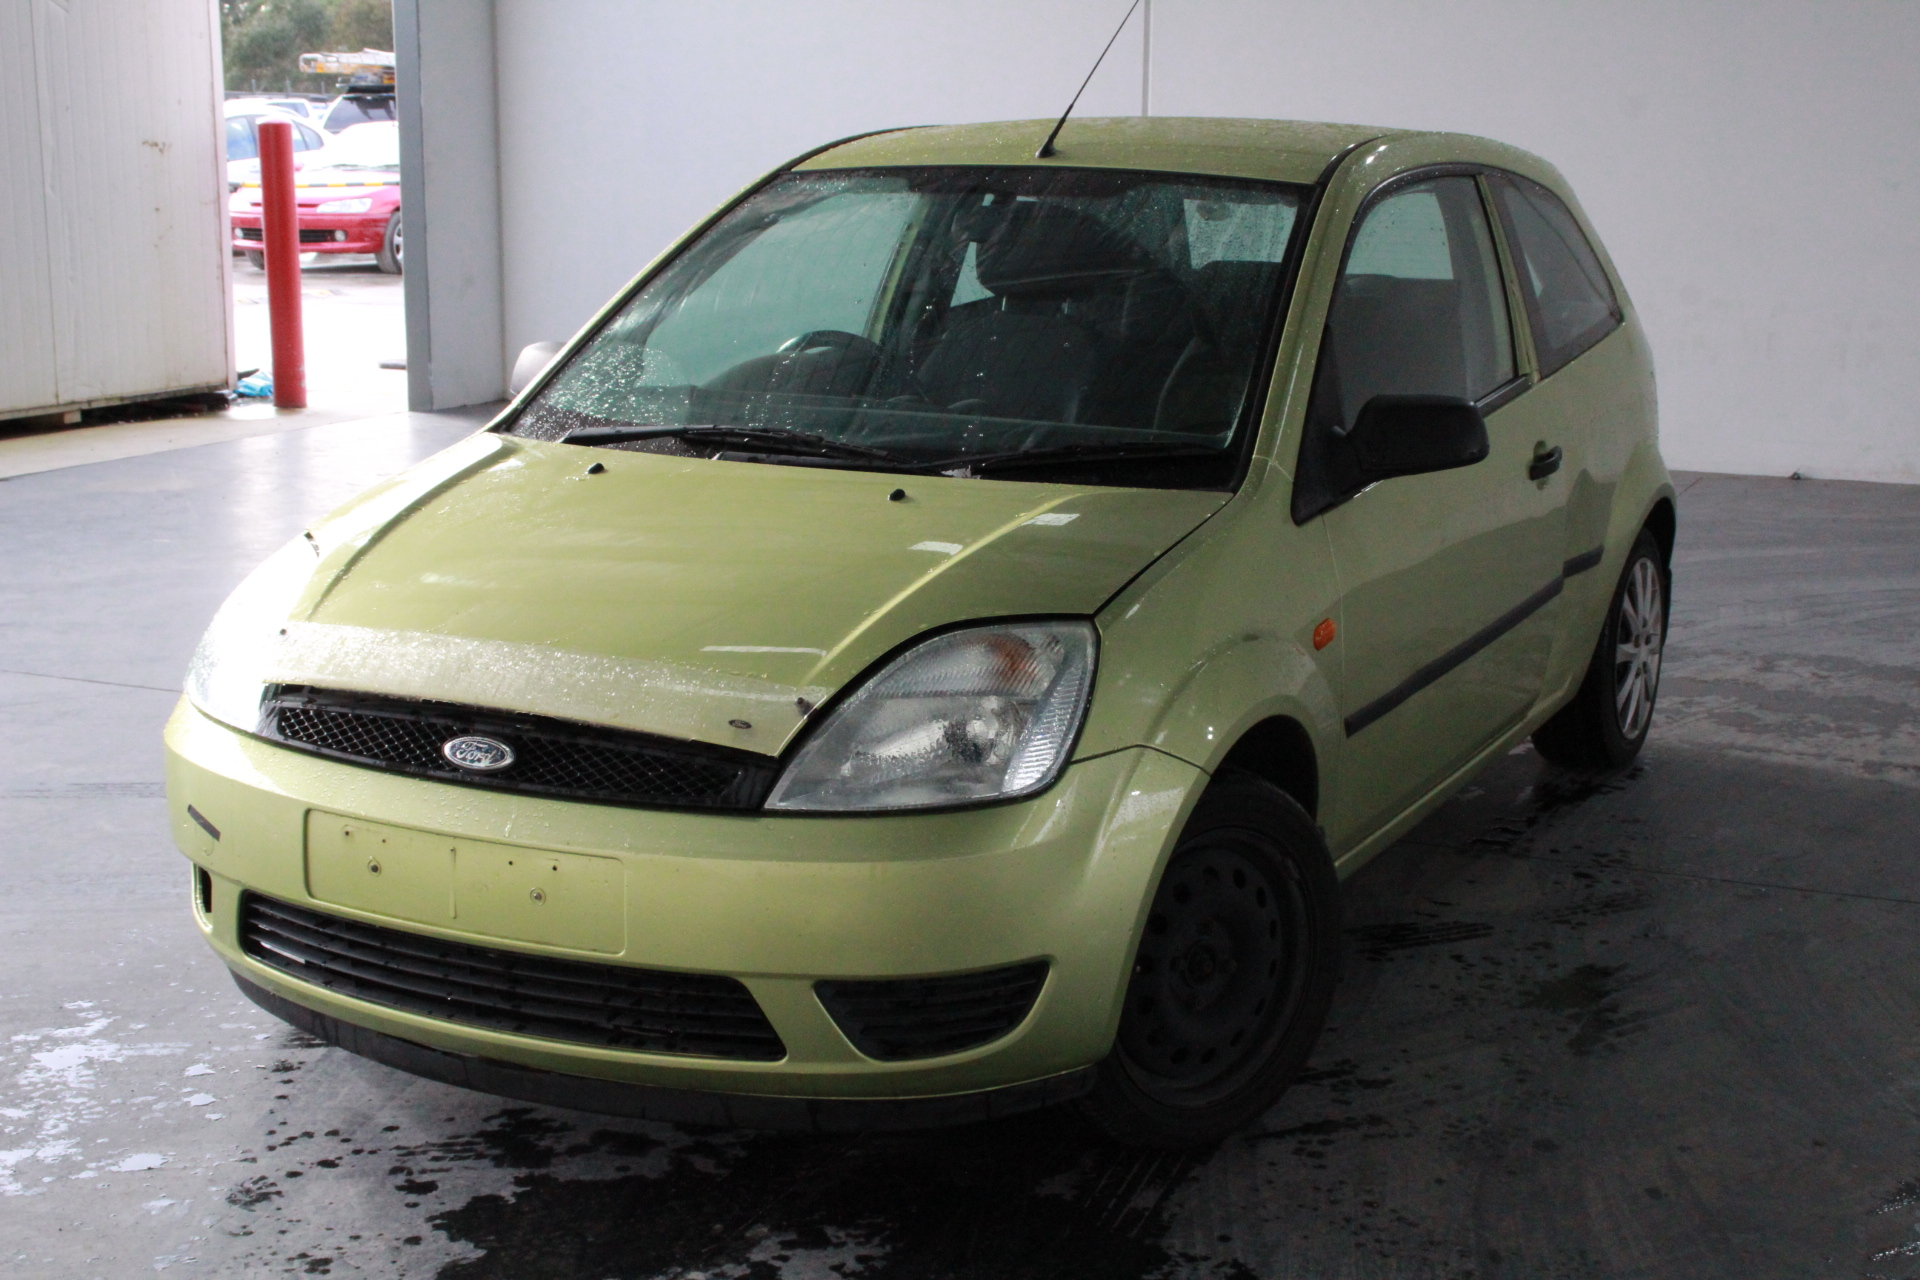 2005 Ford Fiesta LX WP Manual Hatchback